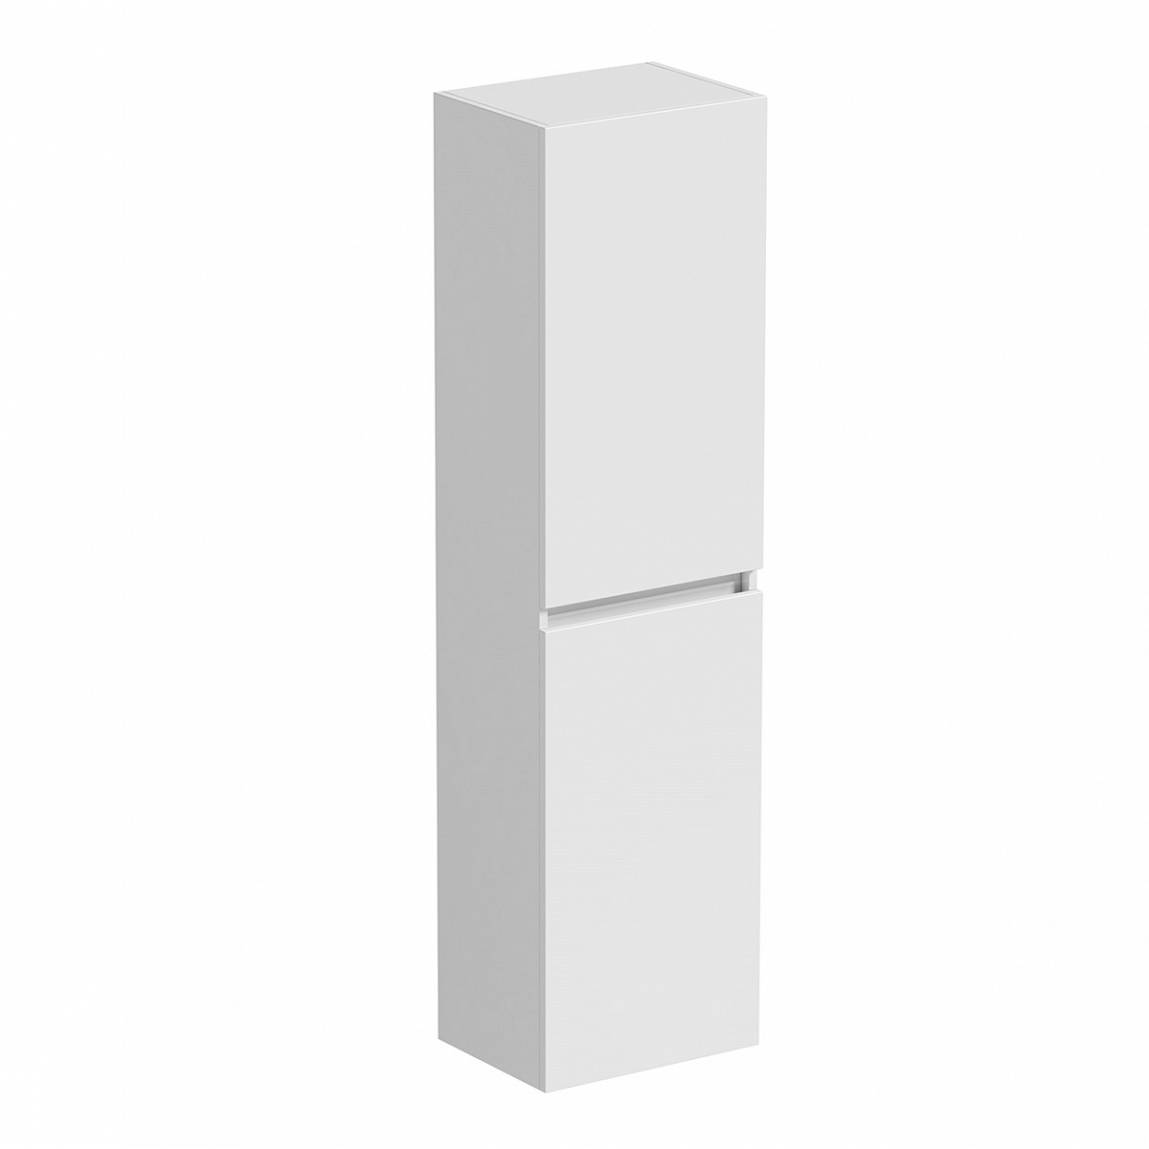 Image of Plan White Tall Unit